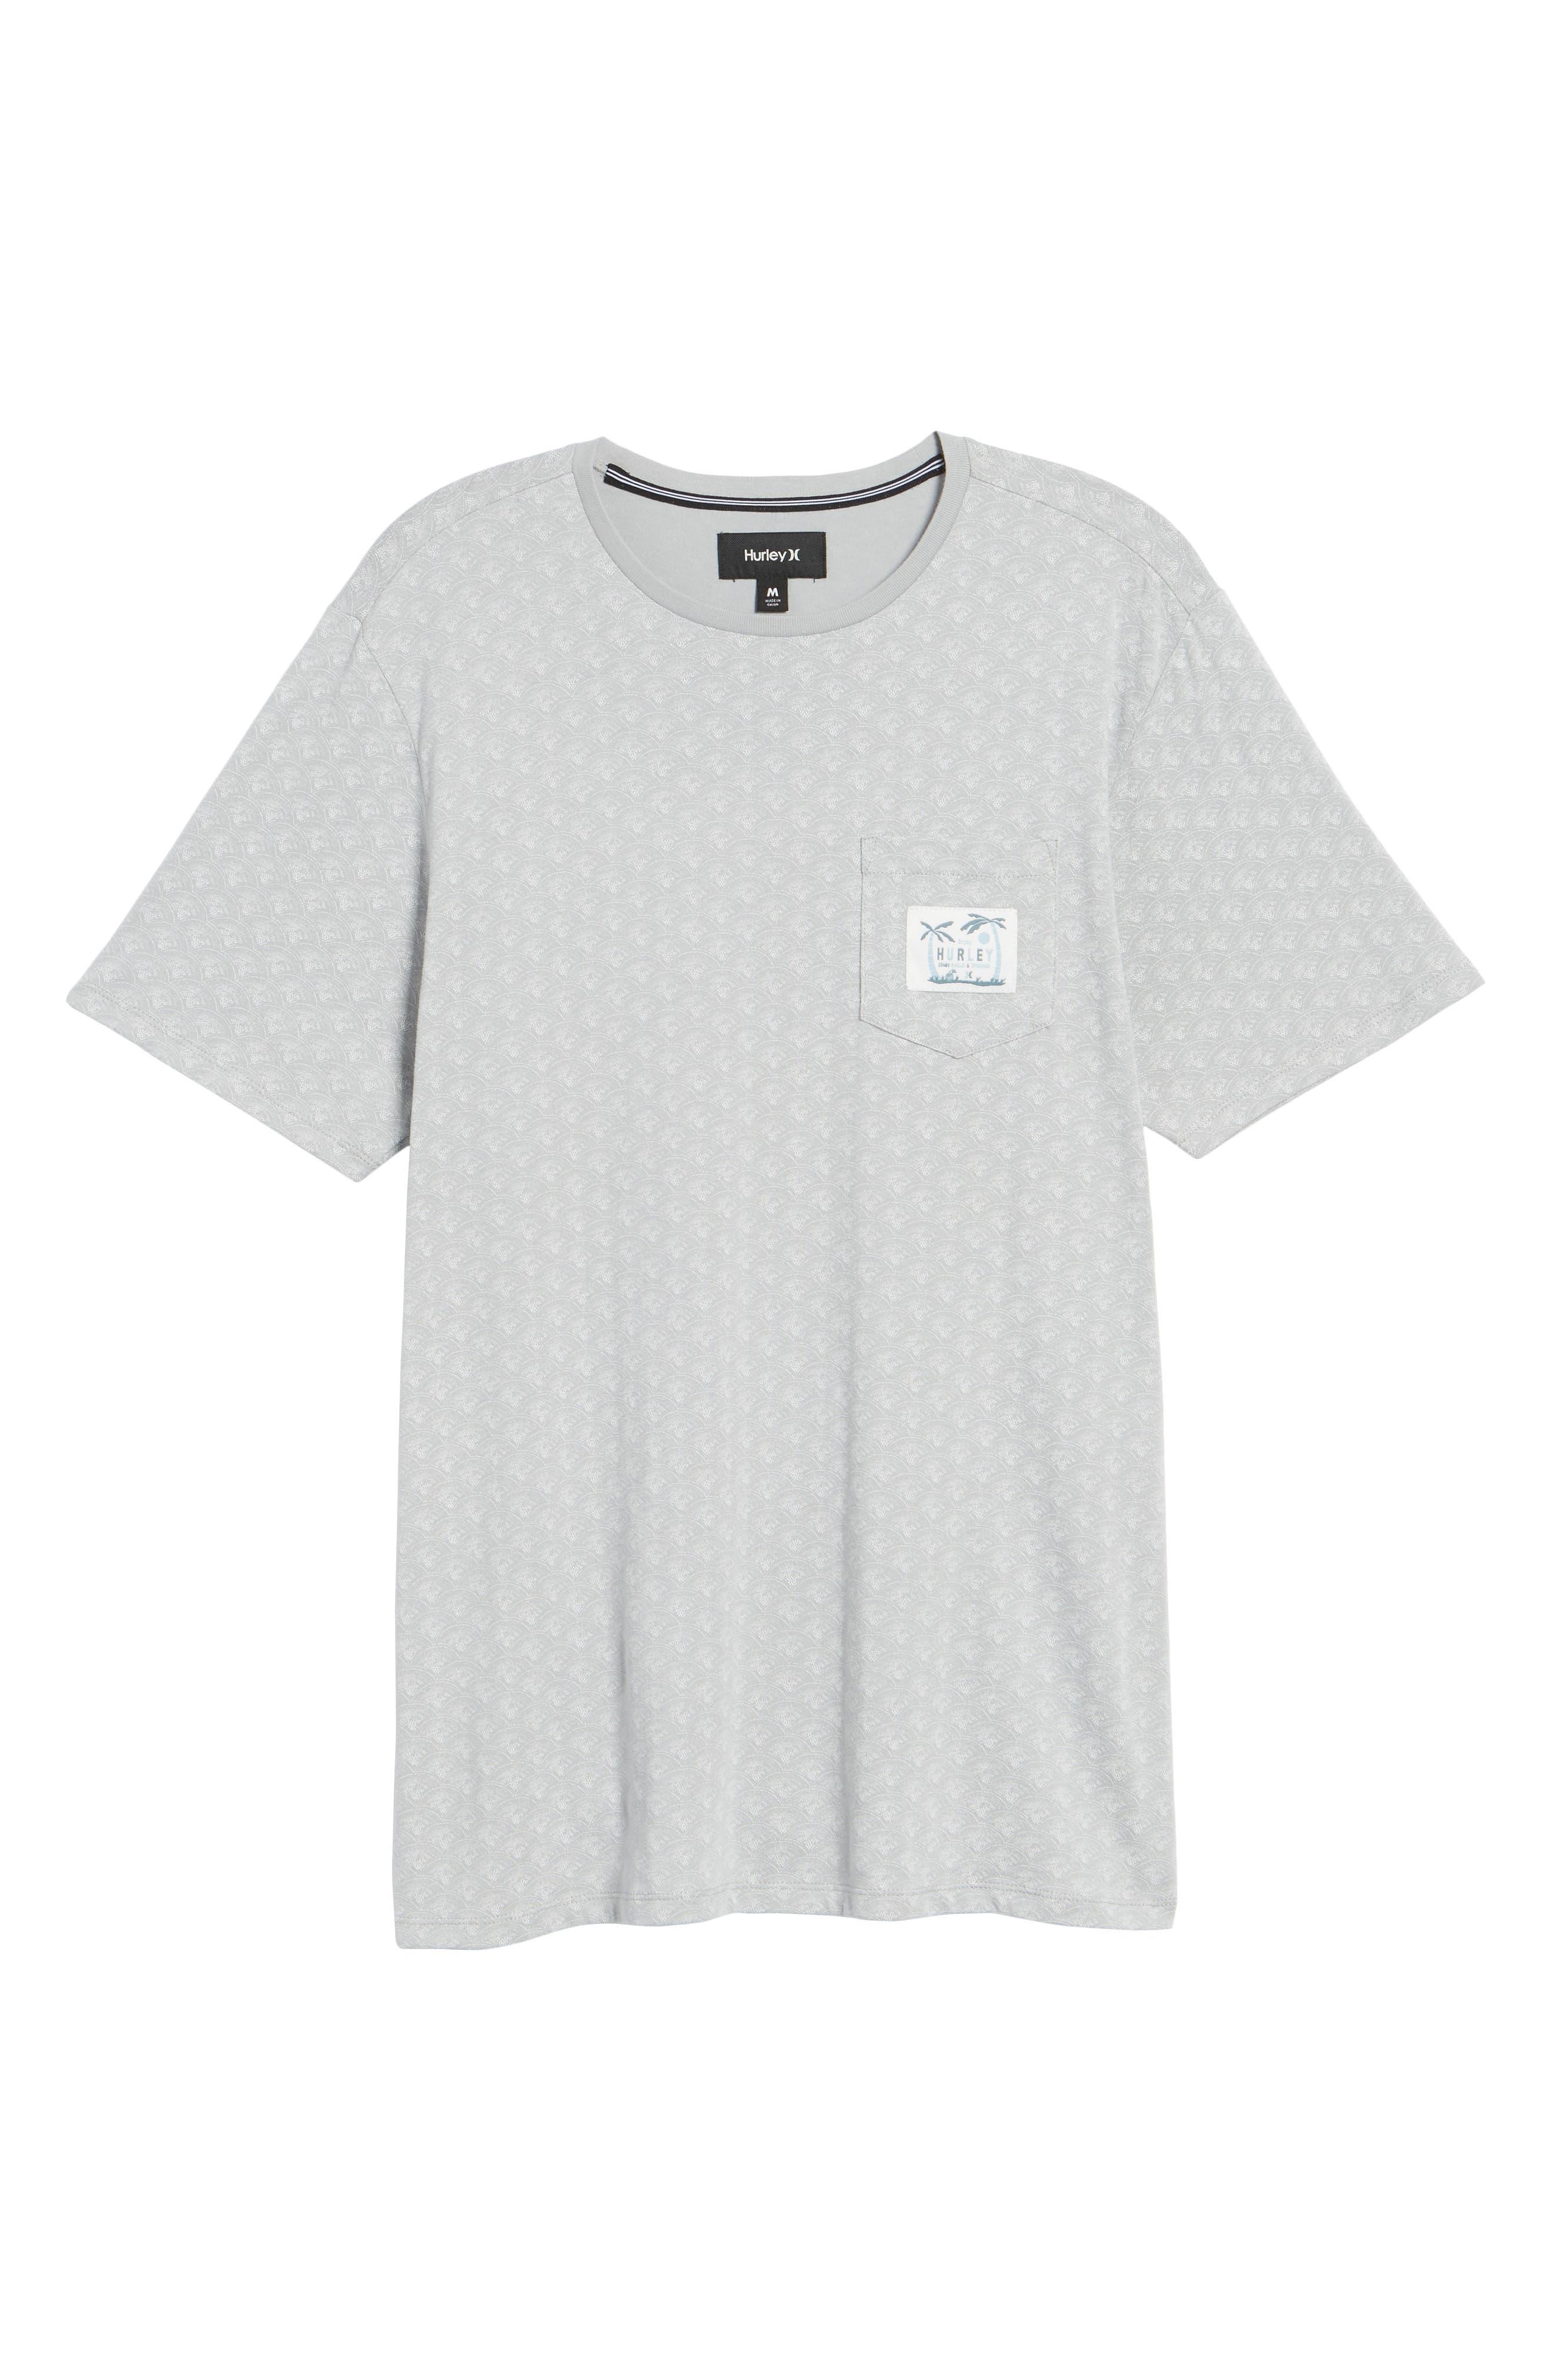 Pescado Short Sleeve T-Shirt,                             Alternate thumbnail 6, color,                             Sail